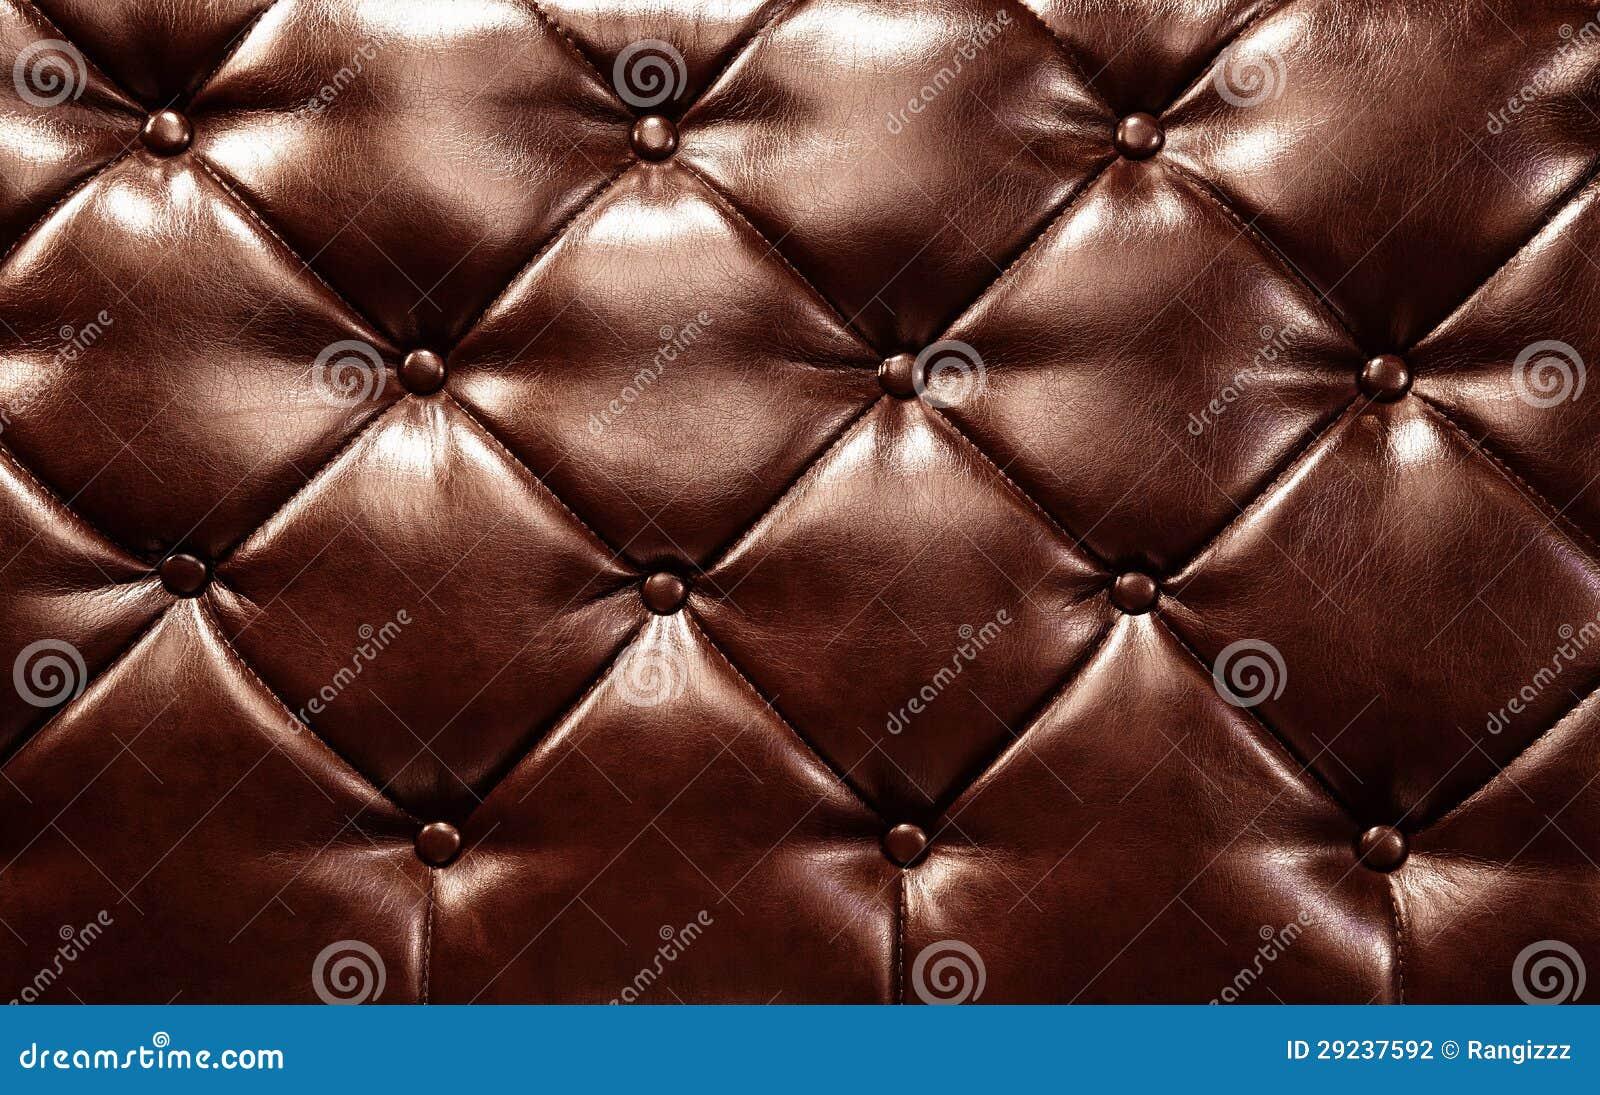 Download Fundo de couro escuro foto de stock. Imagem de naughty - 29237592